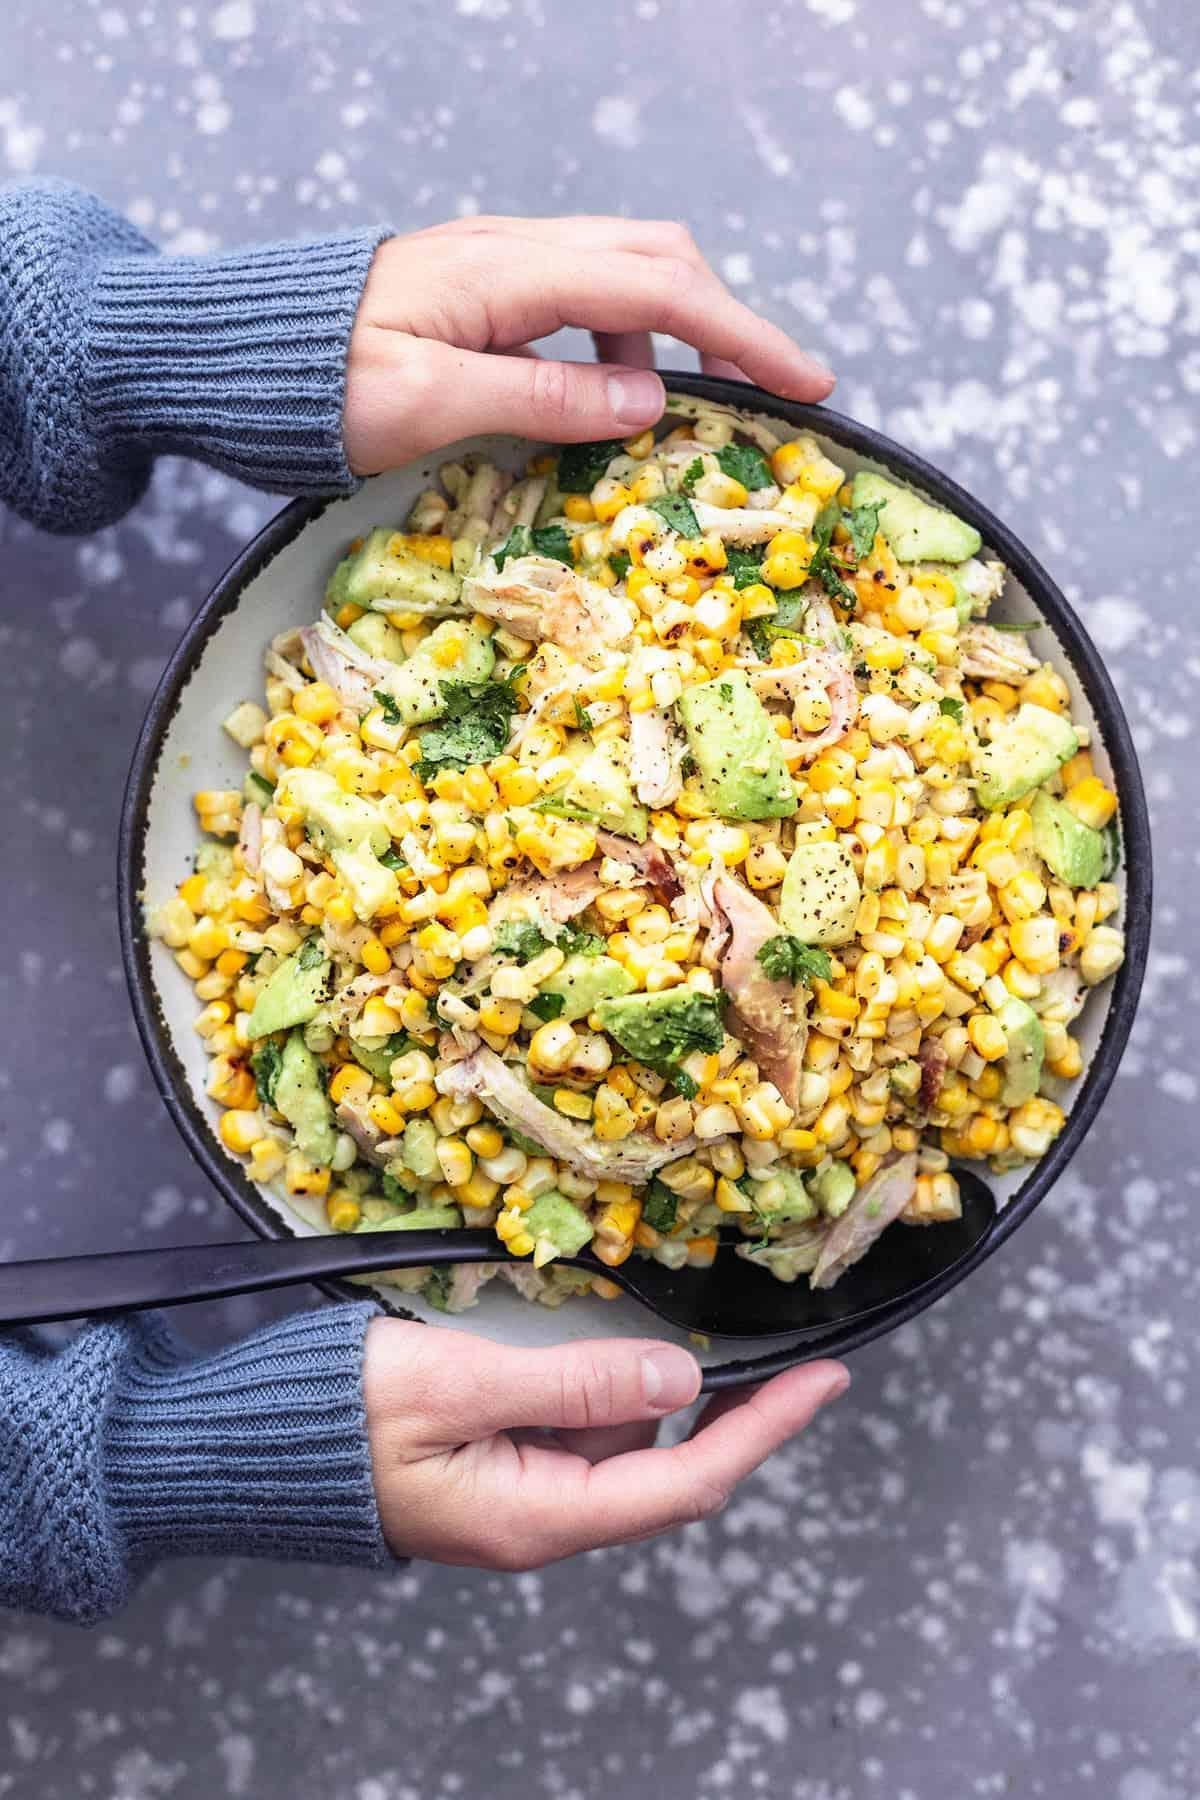 HÜHNCHEN AVOCADO MAISALAT einfaches gesundes Rezept | lecremedelacrumb.com